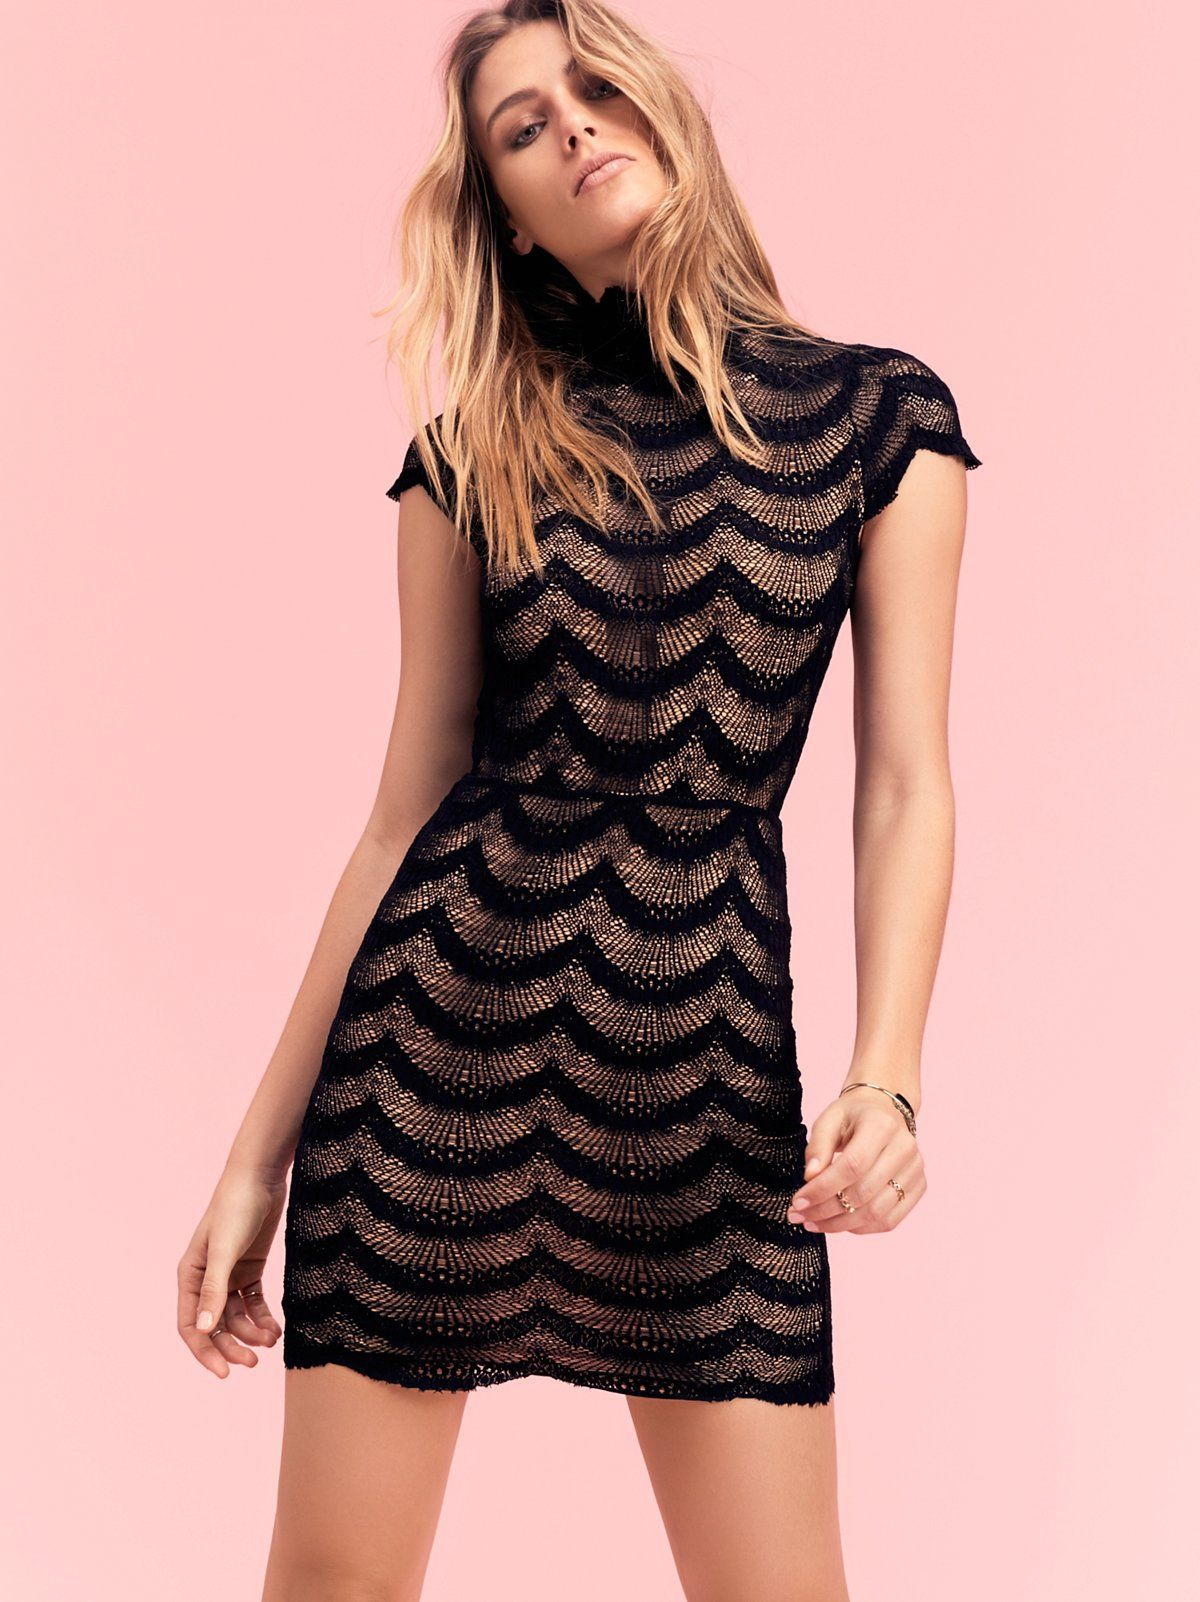 Fiesta Fan District Mini Dress | Sheer lace bodycon mini dress ...